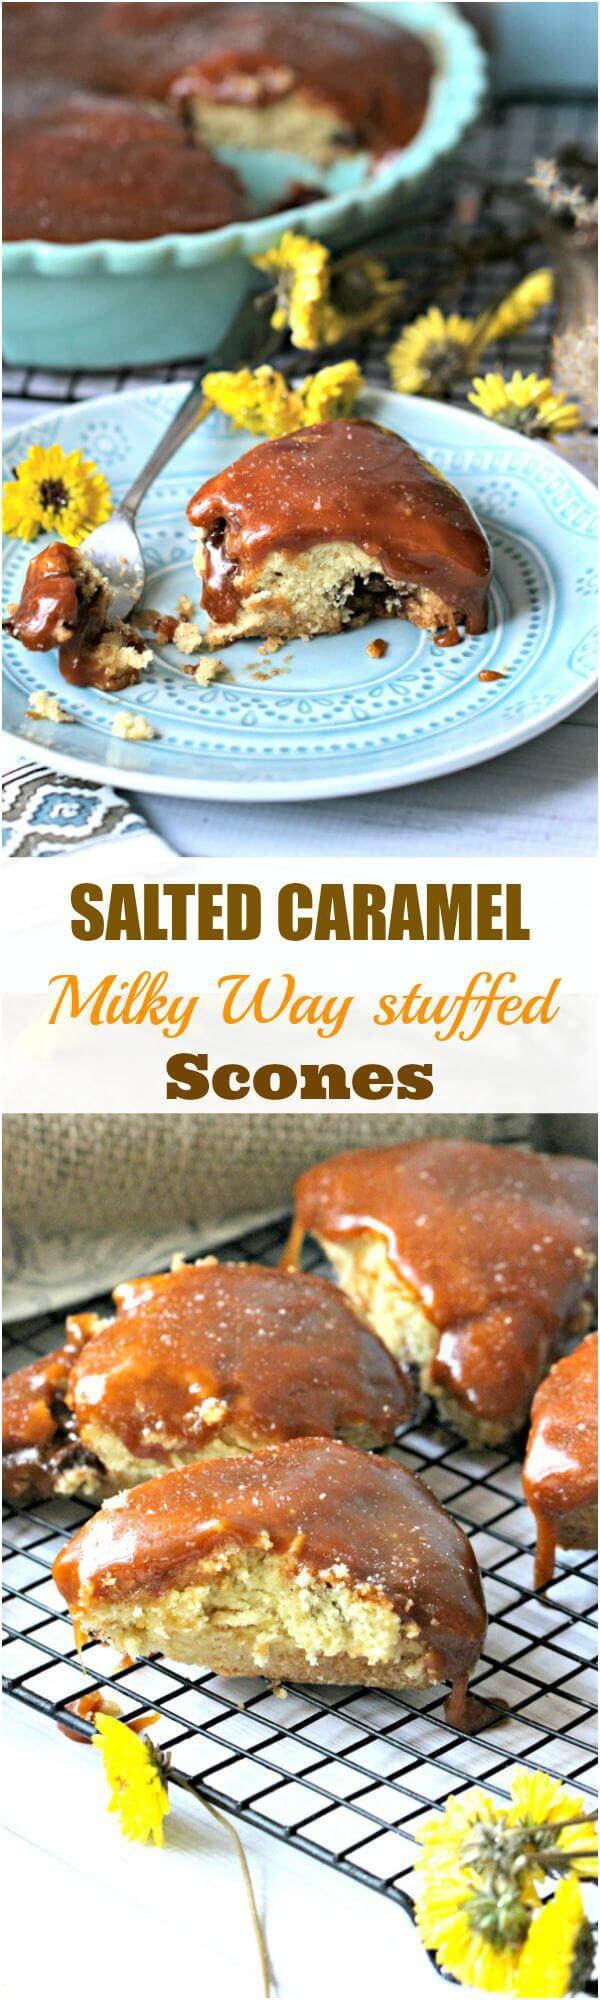 salted caramel scones